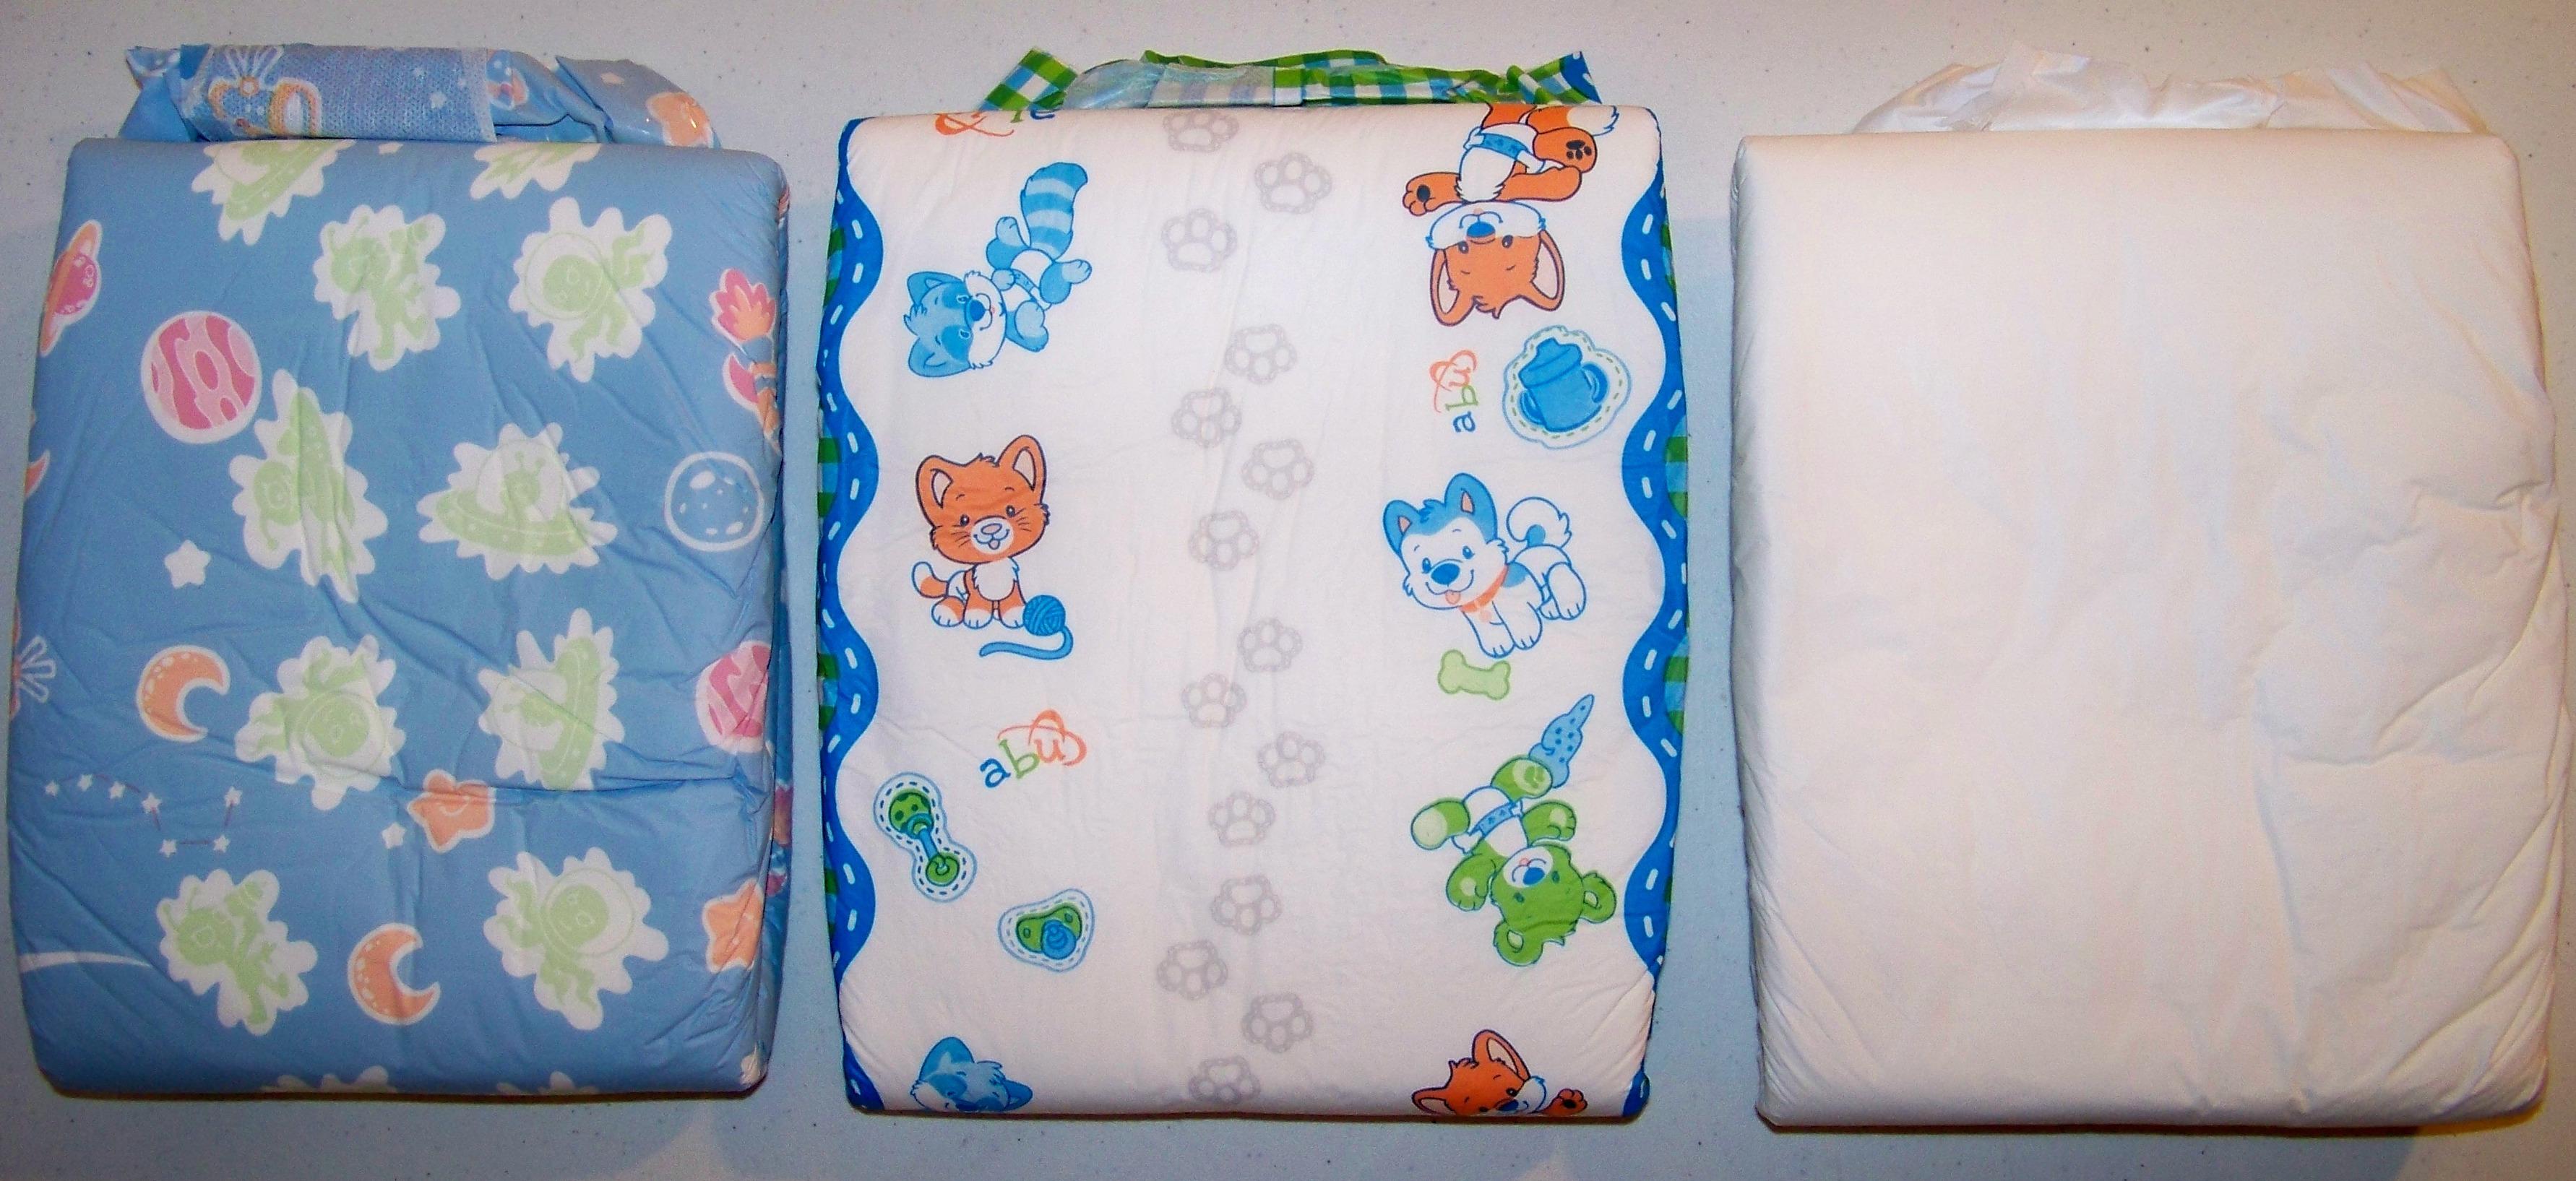 ABU Little Pawz Diapers Pack of 10 Medium